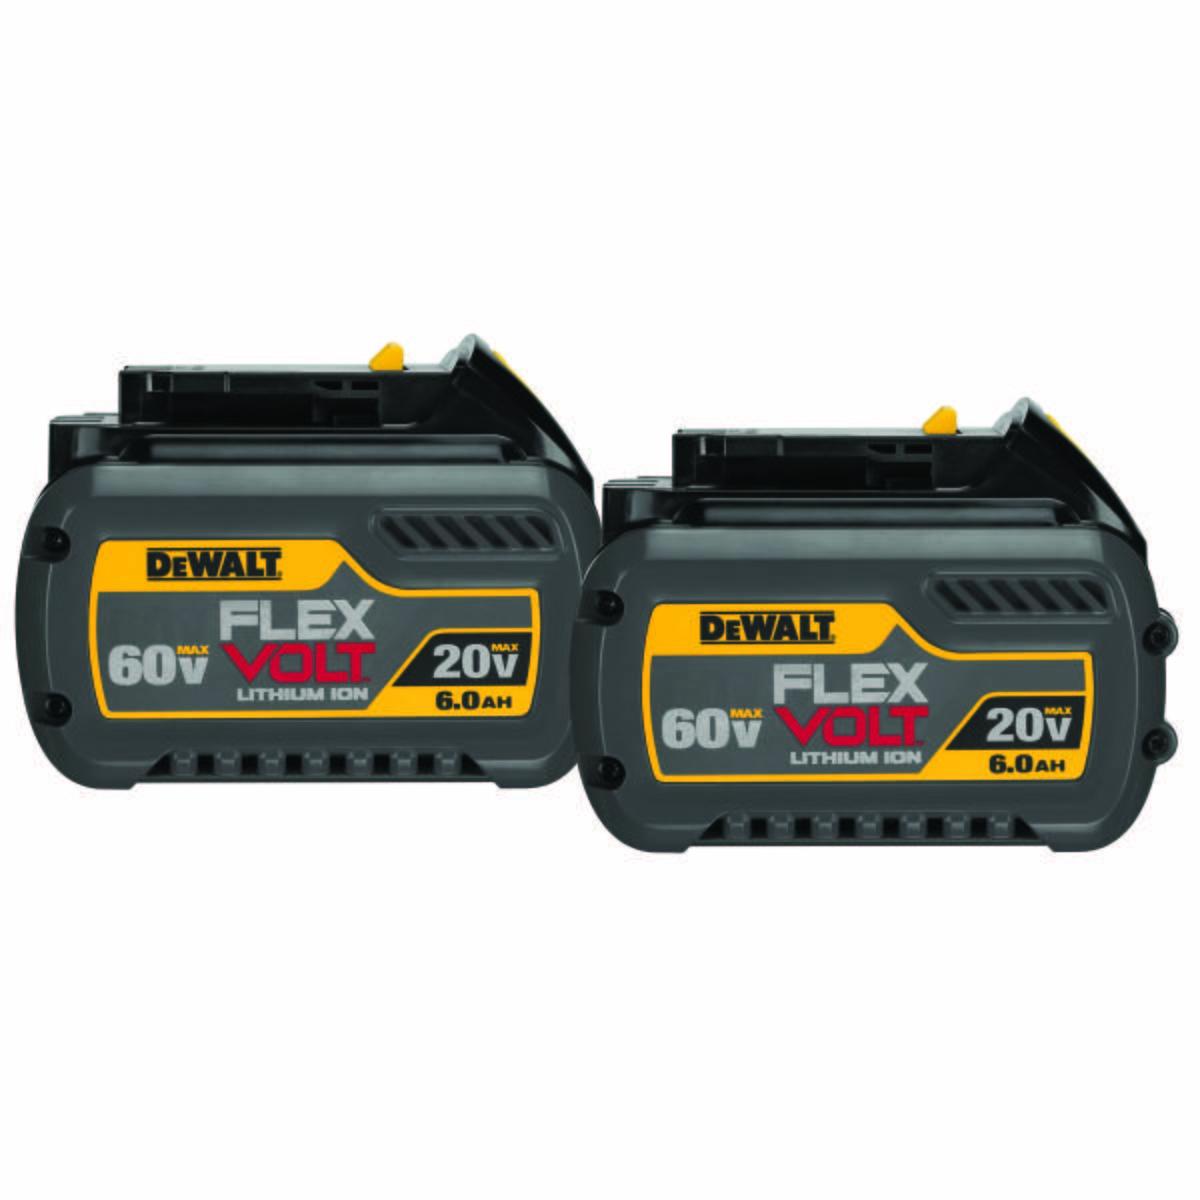 FLEXVOLT 20/60V MAX BATTERY PACK 6.0AH DUAL PACK